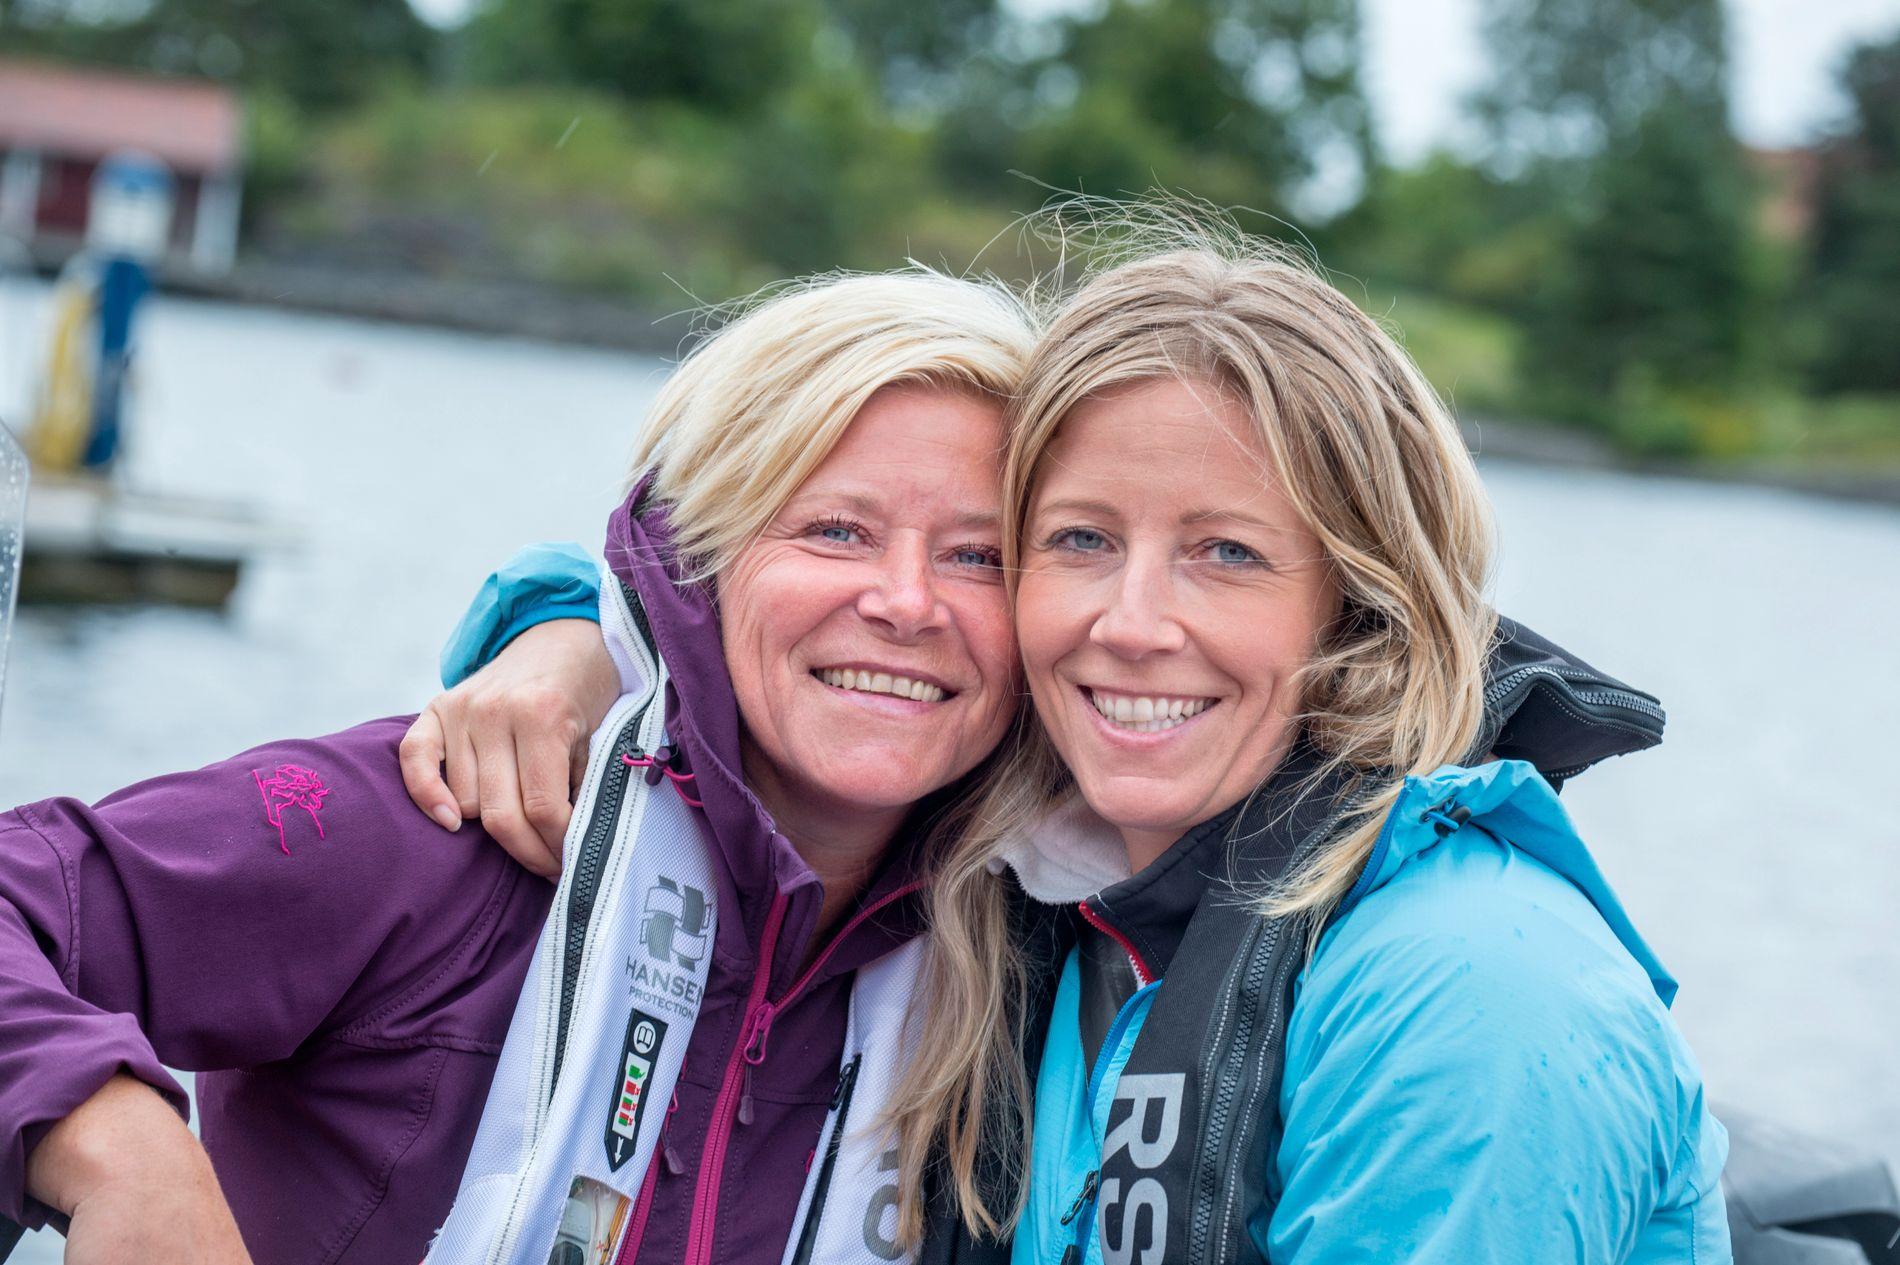 KLIMAKAMP: Generalsekretær i WWF-Norge, Nina Jensen, på båttur sammen med sin søster, finansminister Siv Jensen, i sommer.